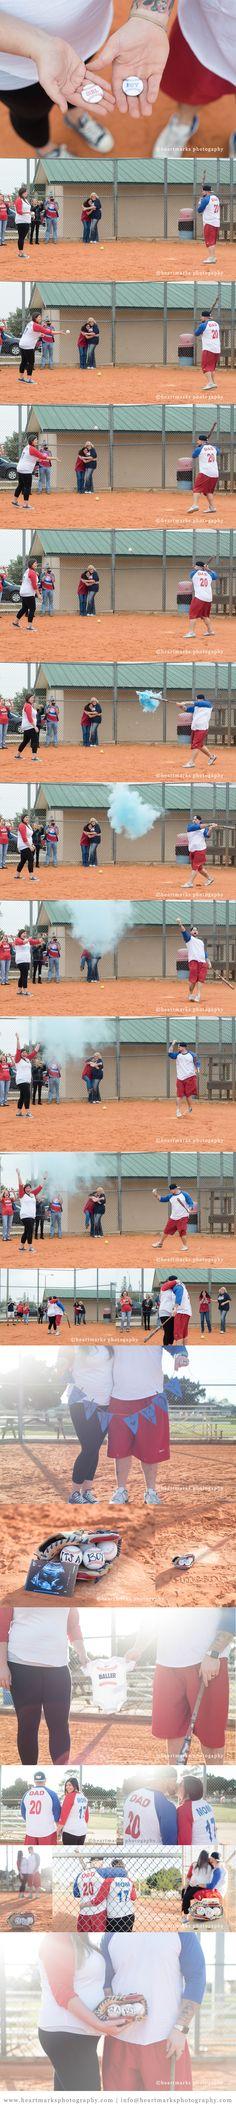 Gender Reveal Baseball Maternity Photography Session | HeartMarks Photography | www.heartmarksphotography.com